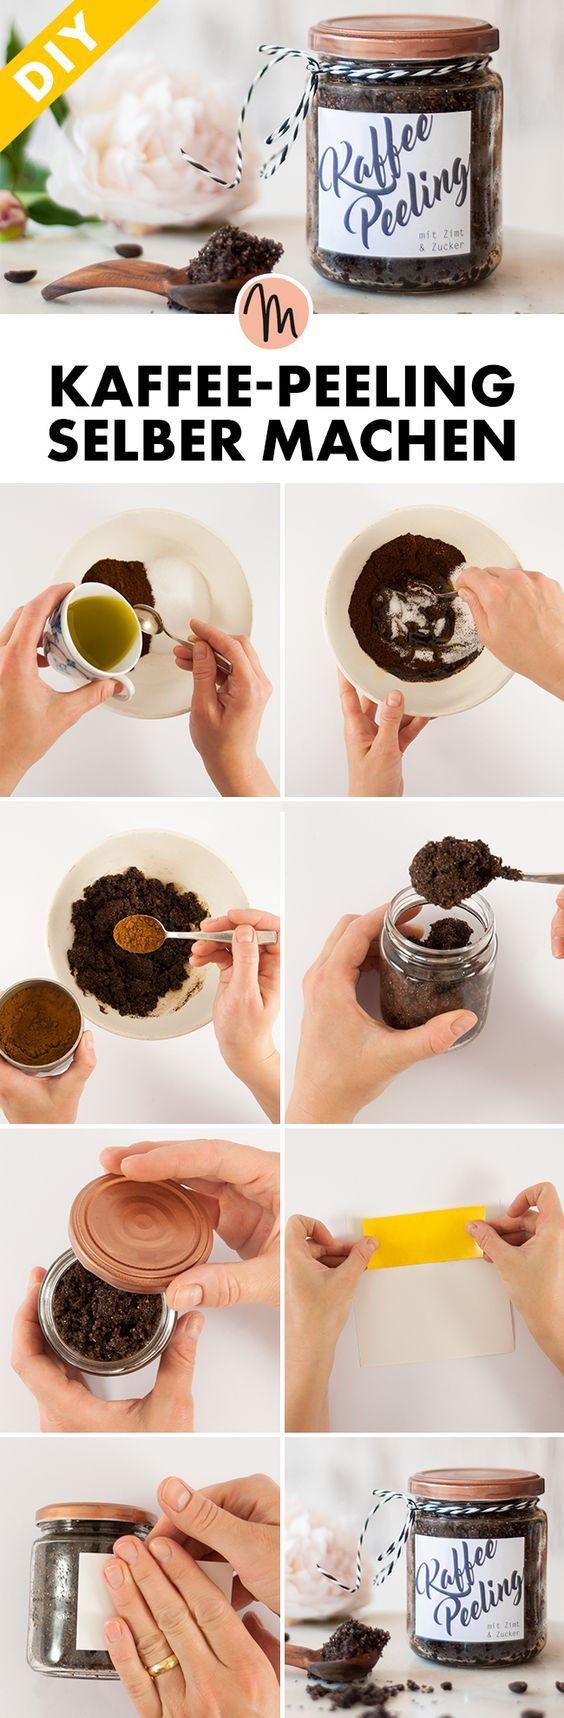 kaffee peeling selber machen diy geschenkidee gratis anleitung via geschenke. Black Bedroom Furniture Sets. Home Design Ideas